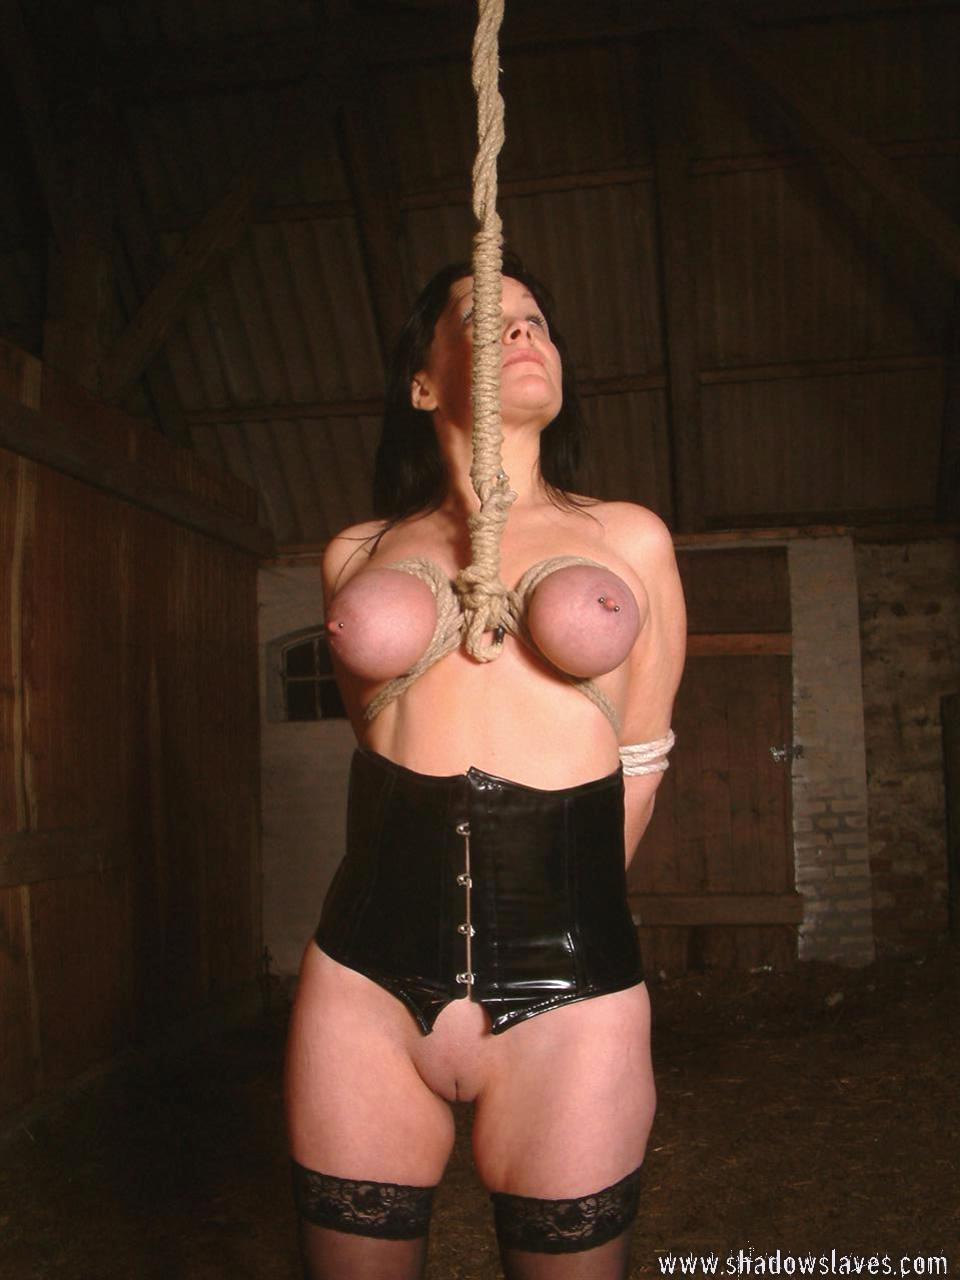 Пытка девушки онлайн 14 фотография